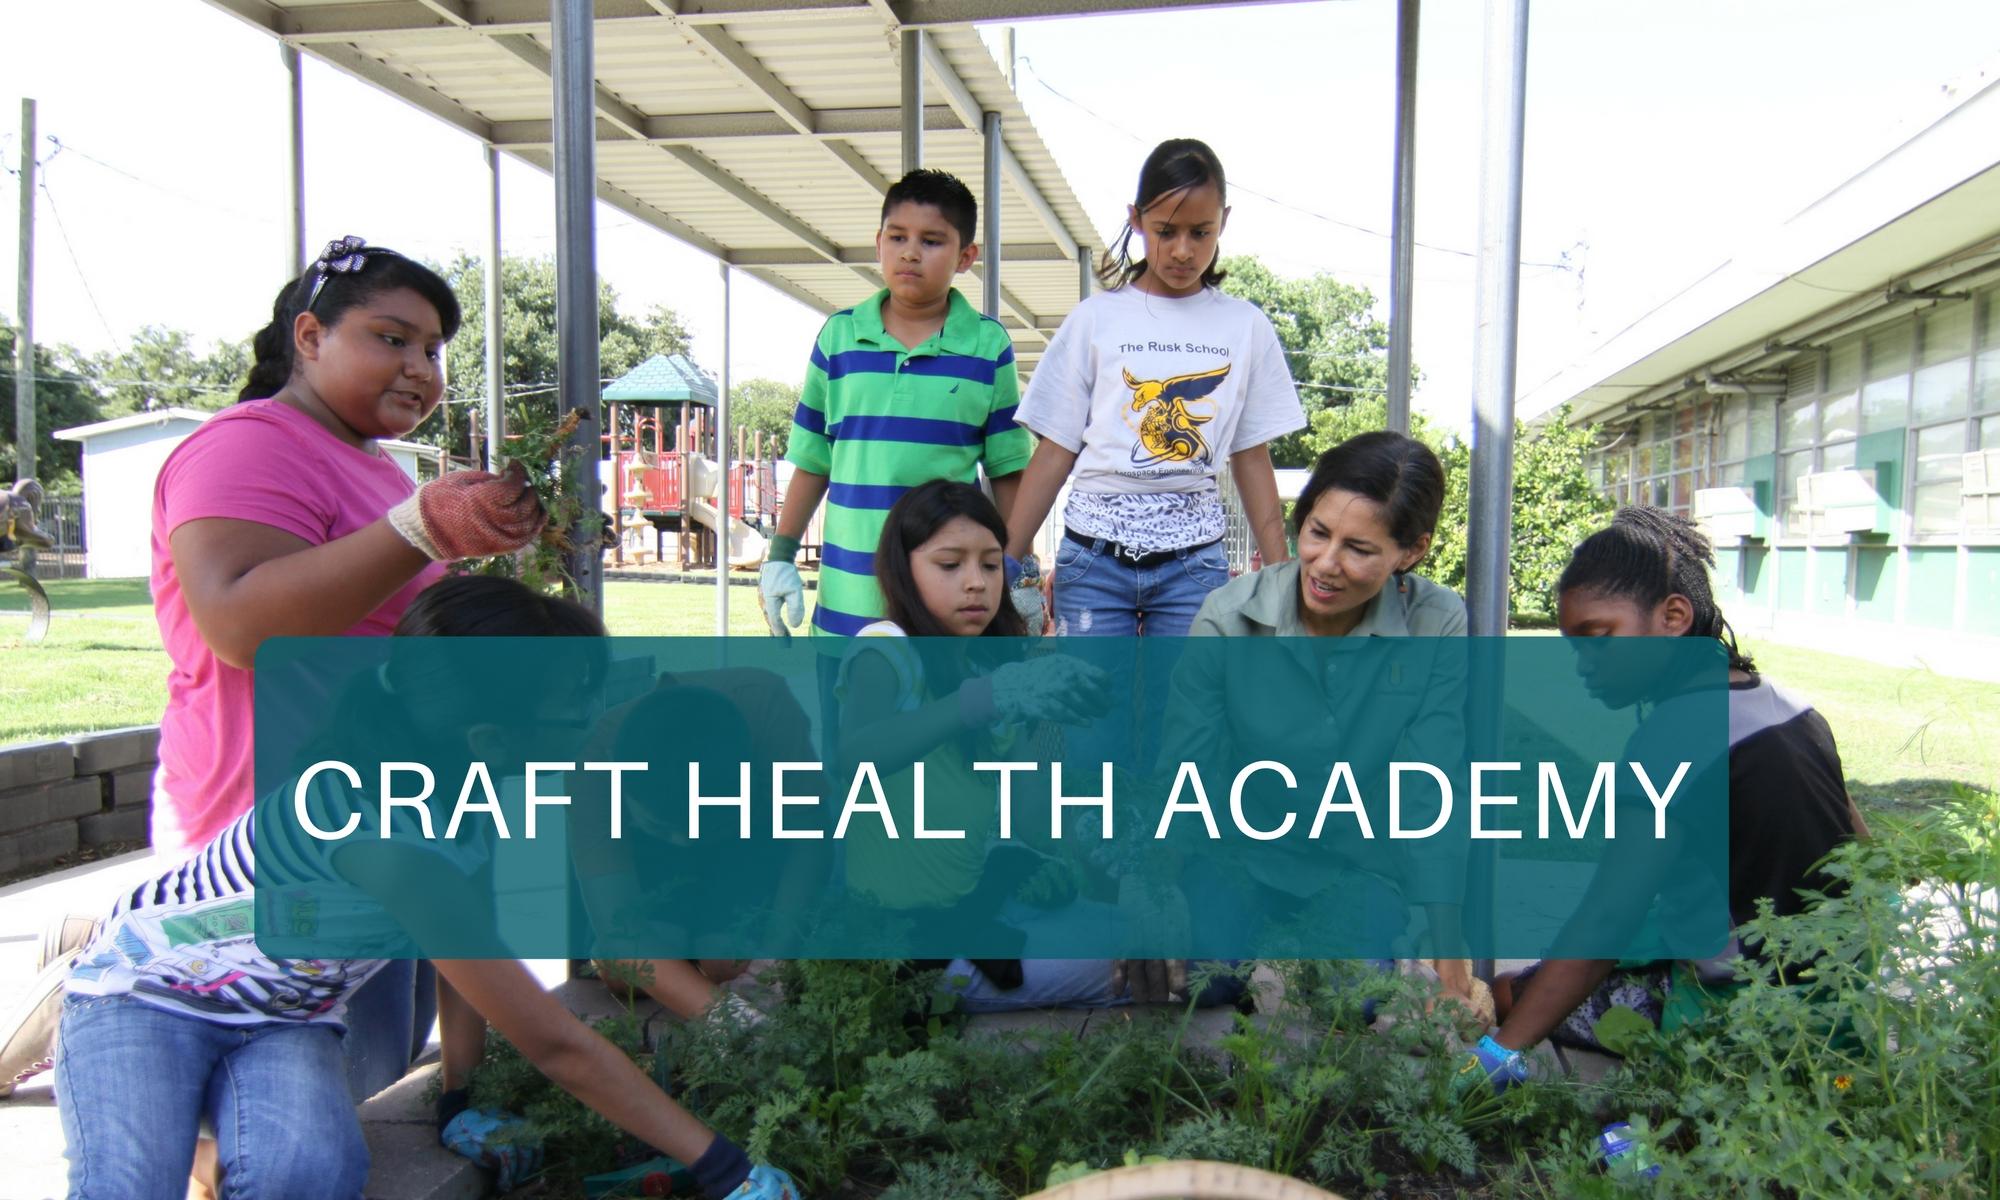 Craft Health Academy